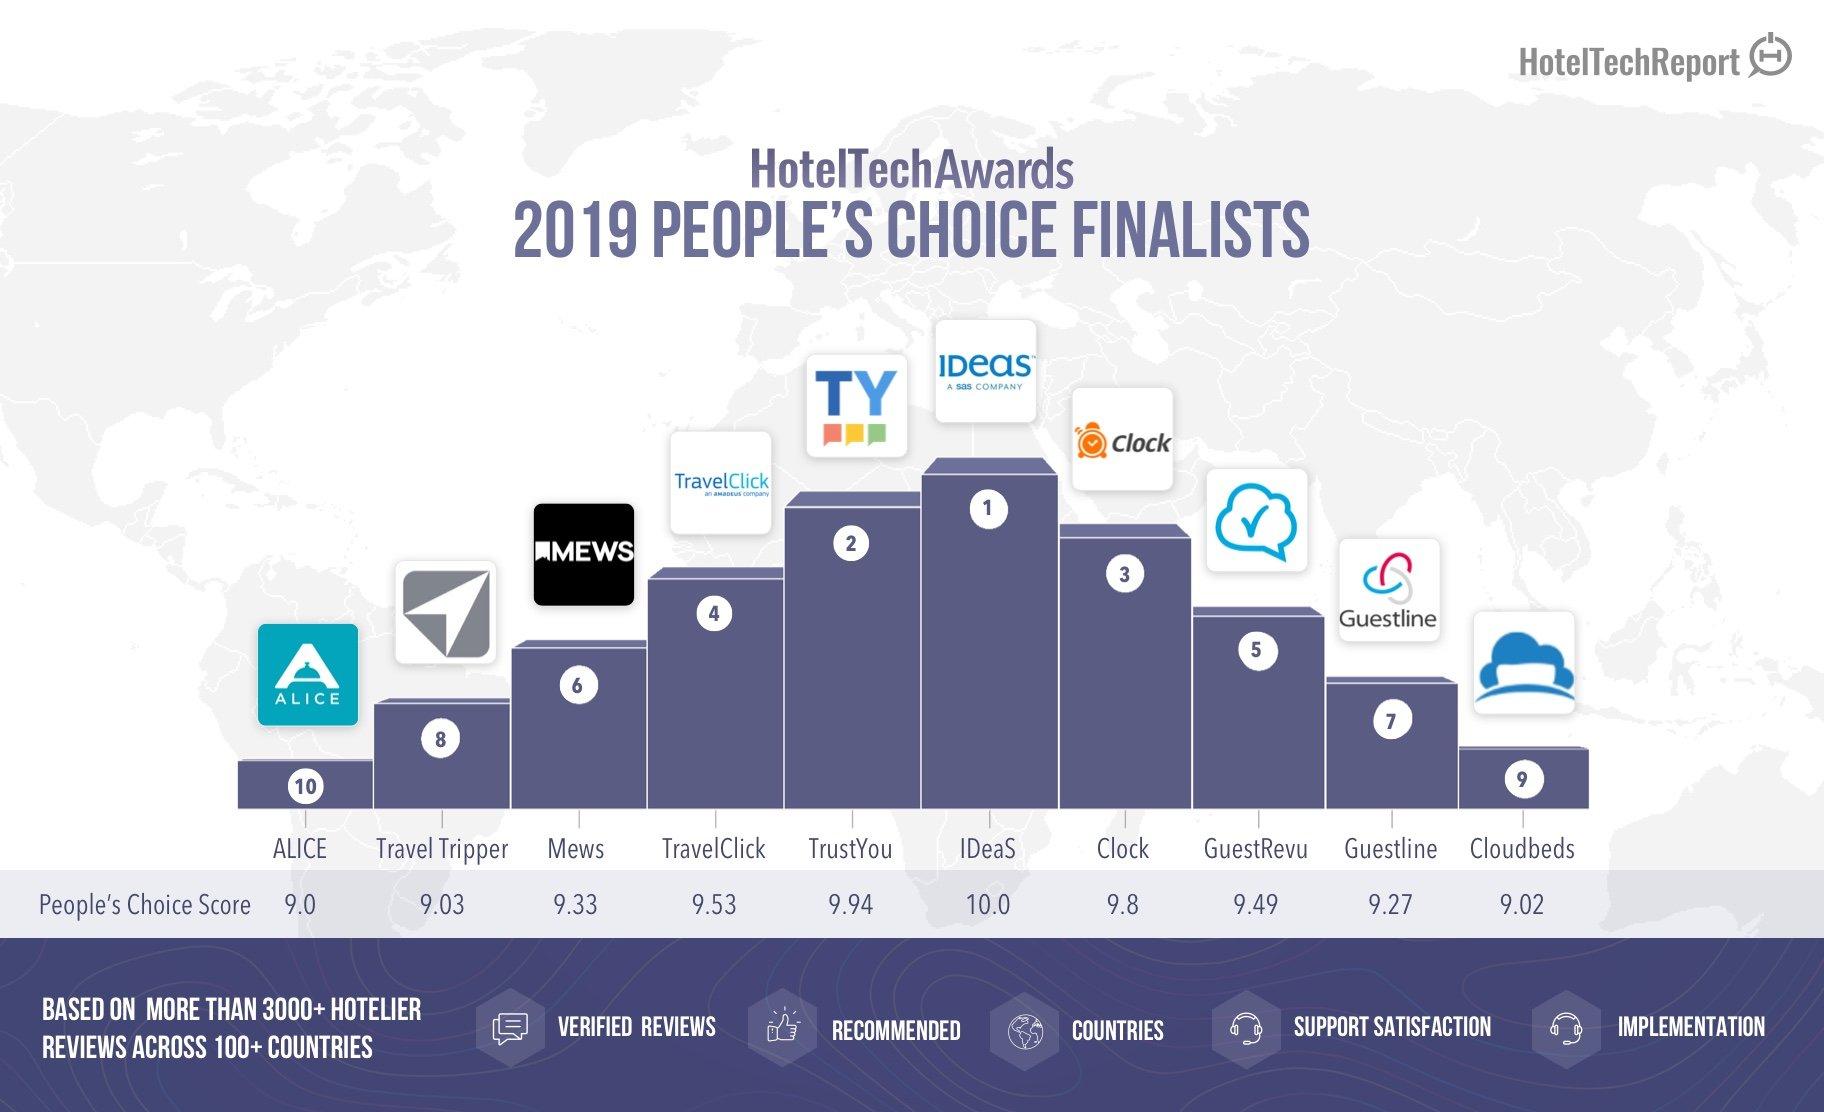 2019-Peoples-Choice-Finalists-GuestRevu